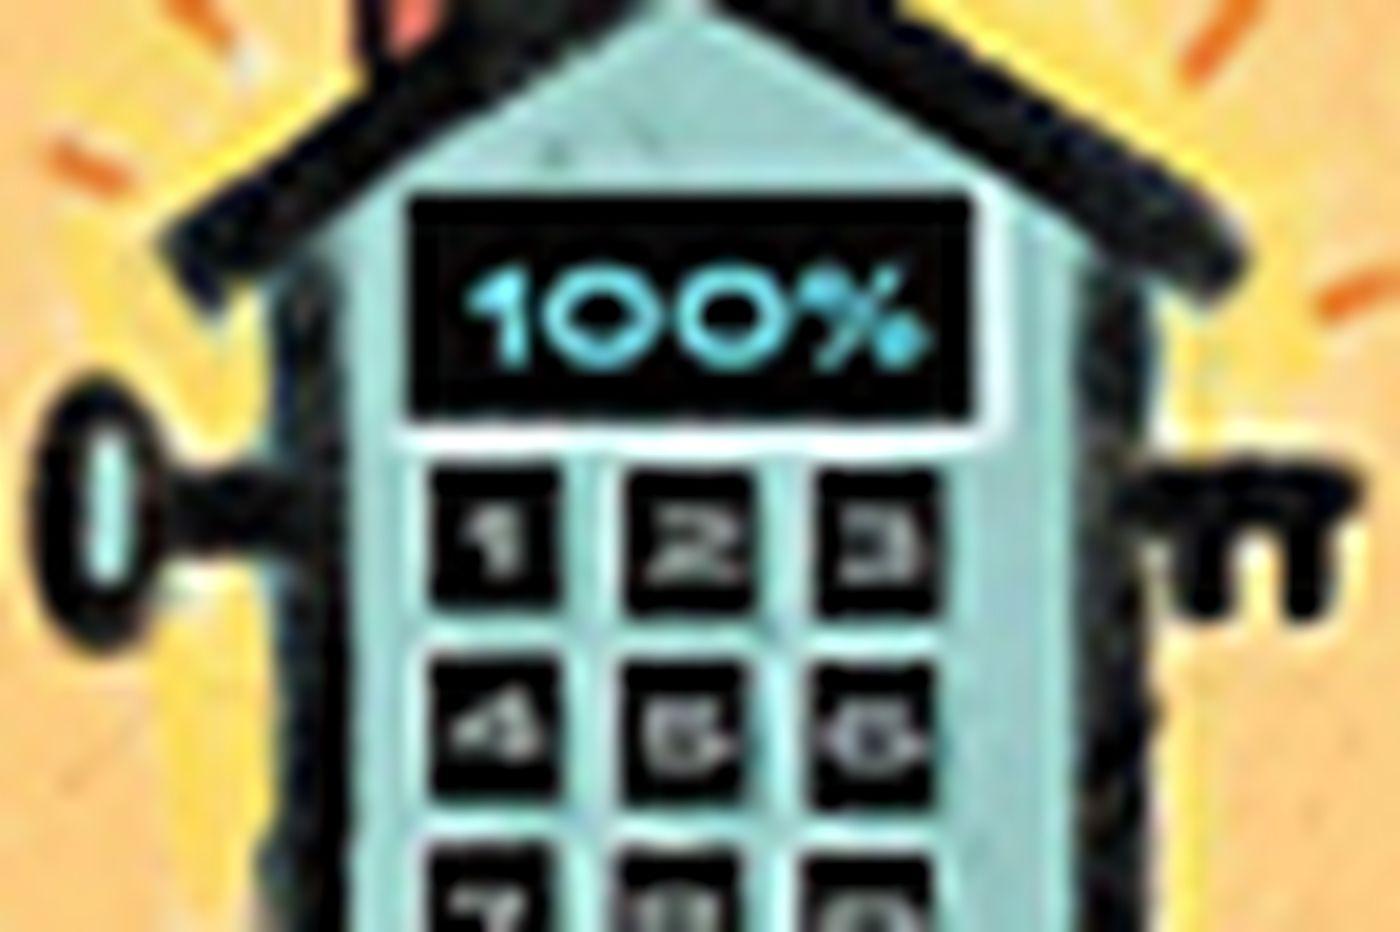 Philadelphia getting 2d shot at saving property-tax revenue